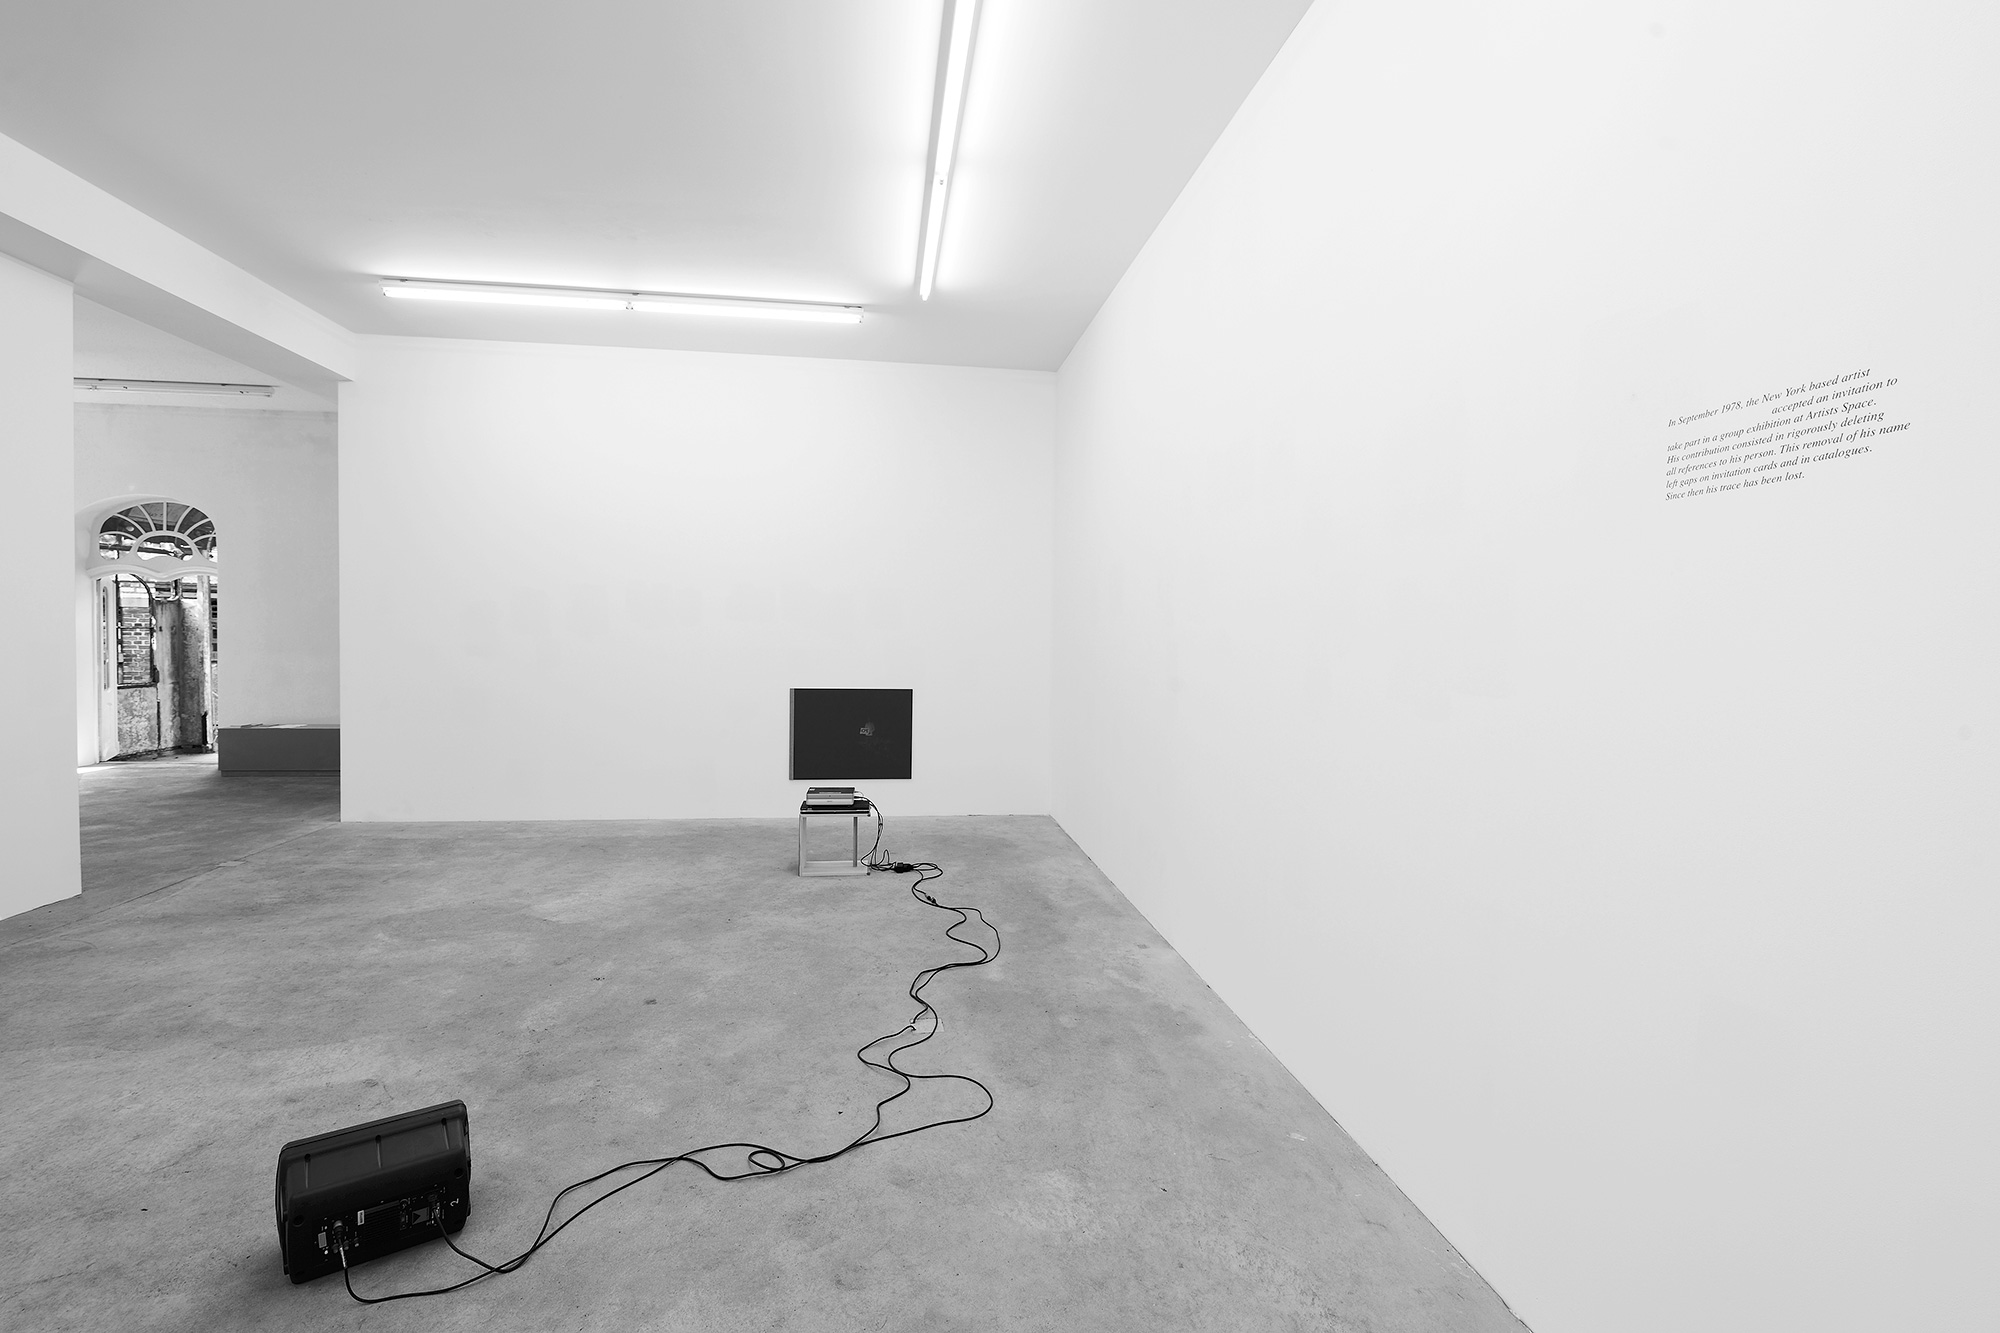 Famed, Untitled [Home], Video #3, 2008